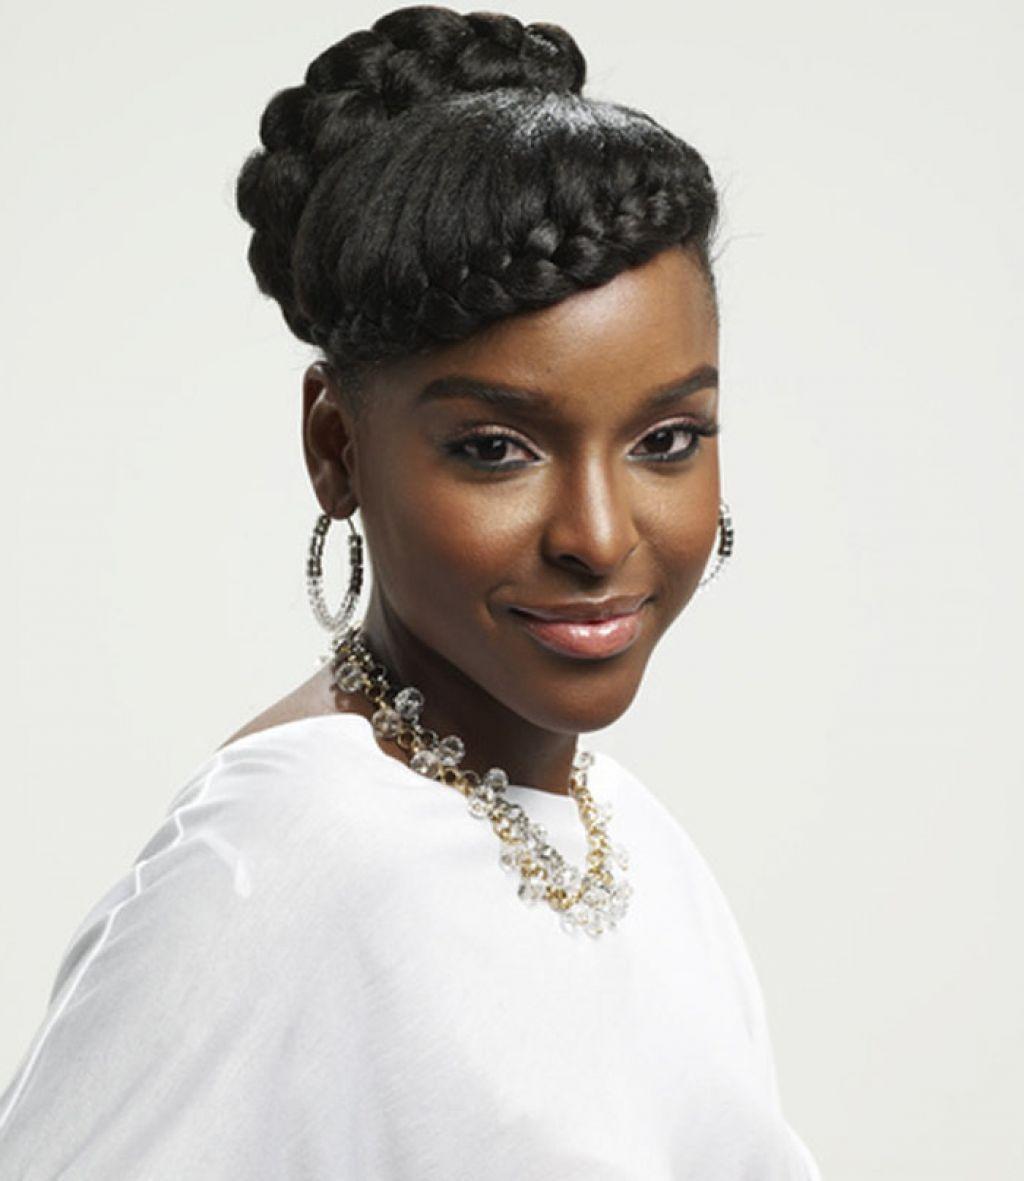 Pin by Regina Ware on I like (hair crush) | Pinterest | African hair ...